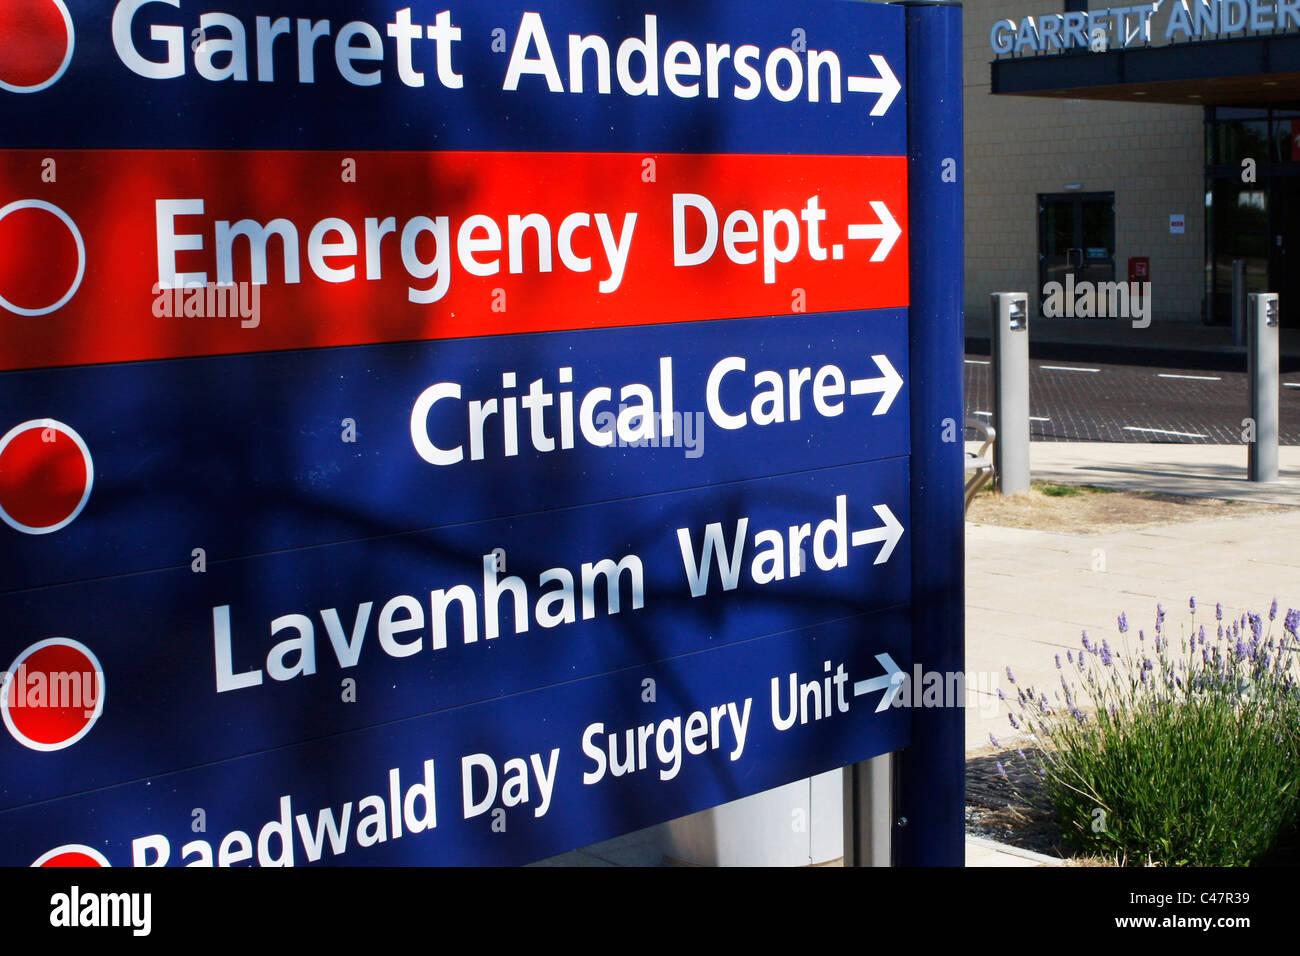 NHS Hospital Signage outside busy UK hospital, including Emergency Dept  sign - Stock Image